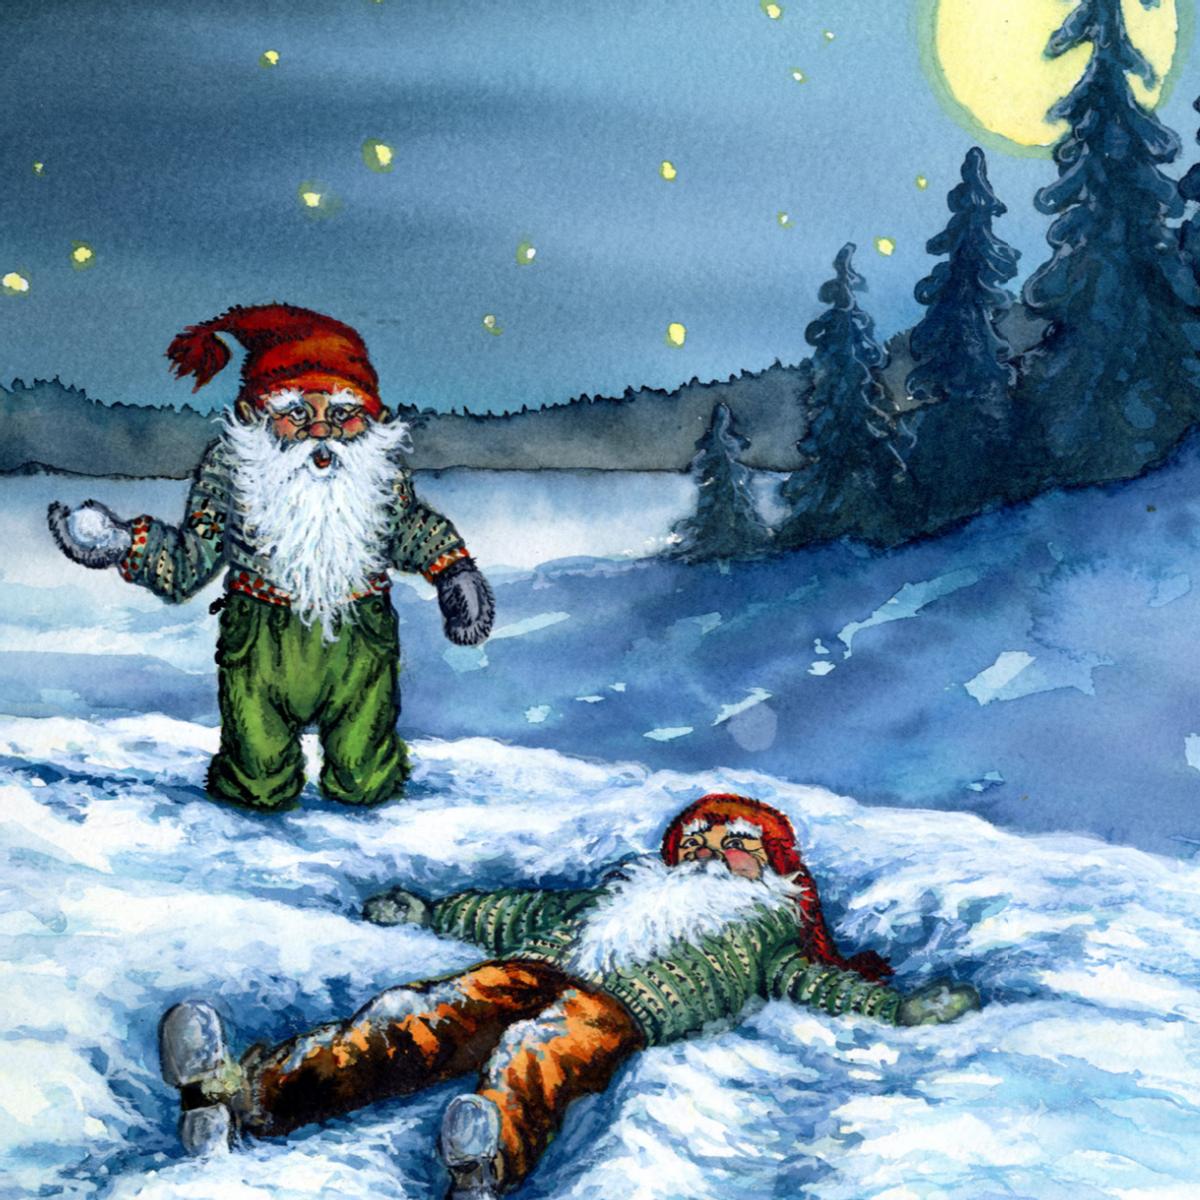 Julekort med motiv fra julens minnebok 18 stk.